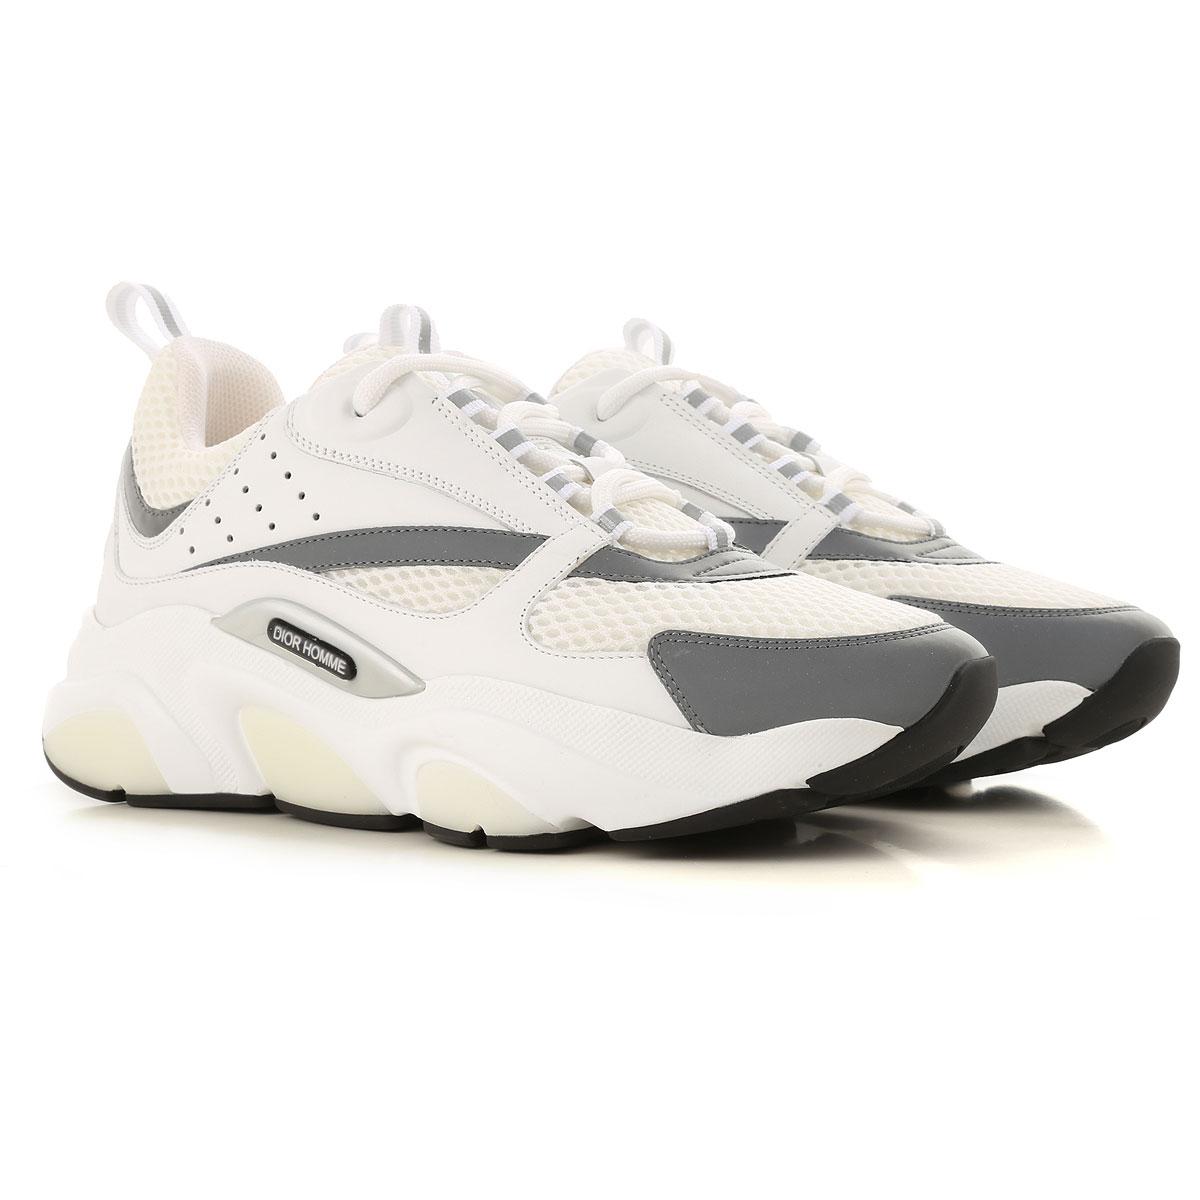 Scarpe Uomo Sneakers Christian Dior Offerte Limitate